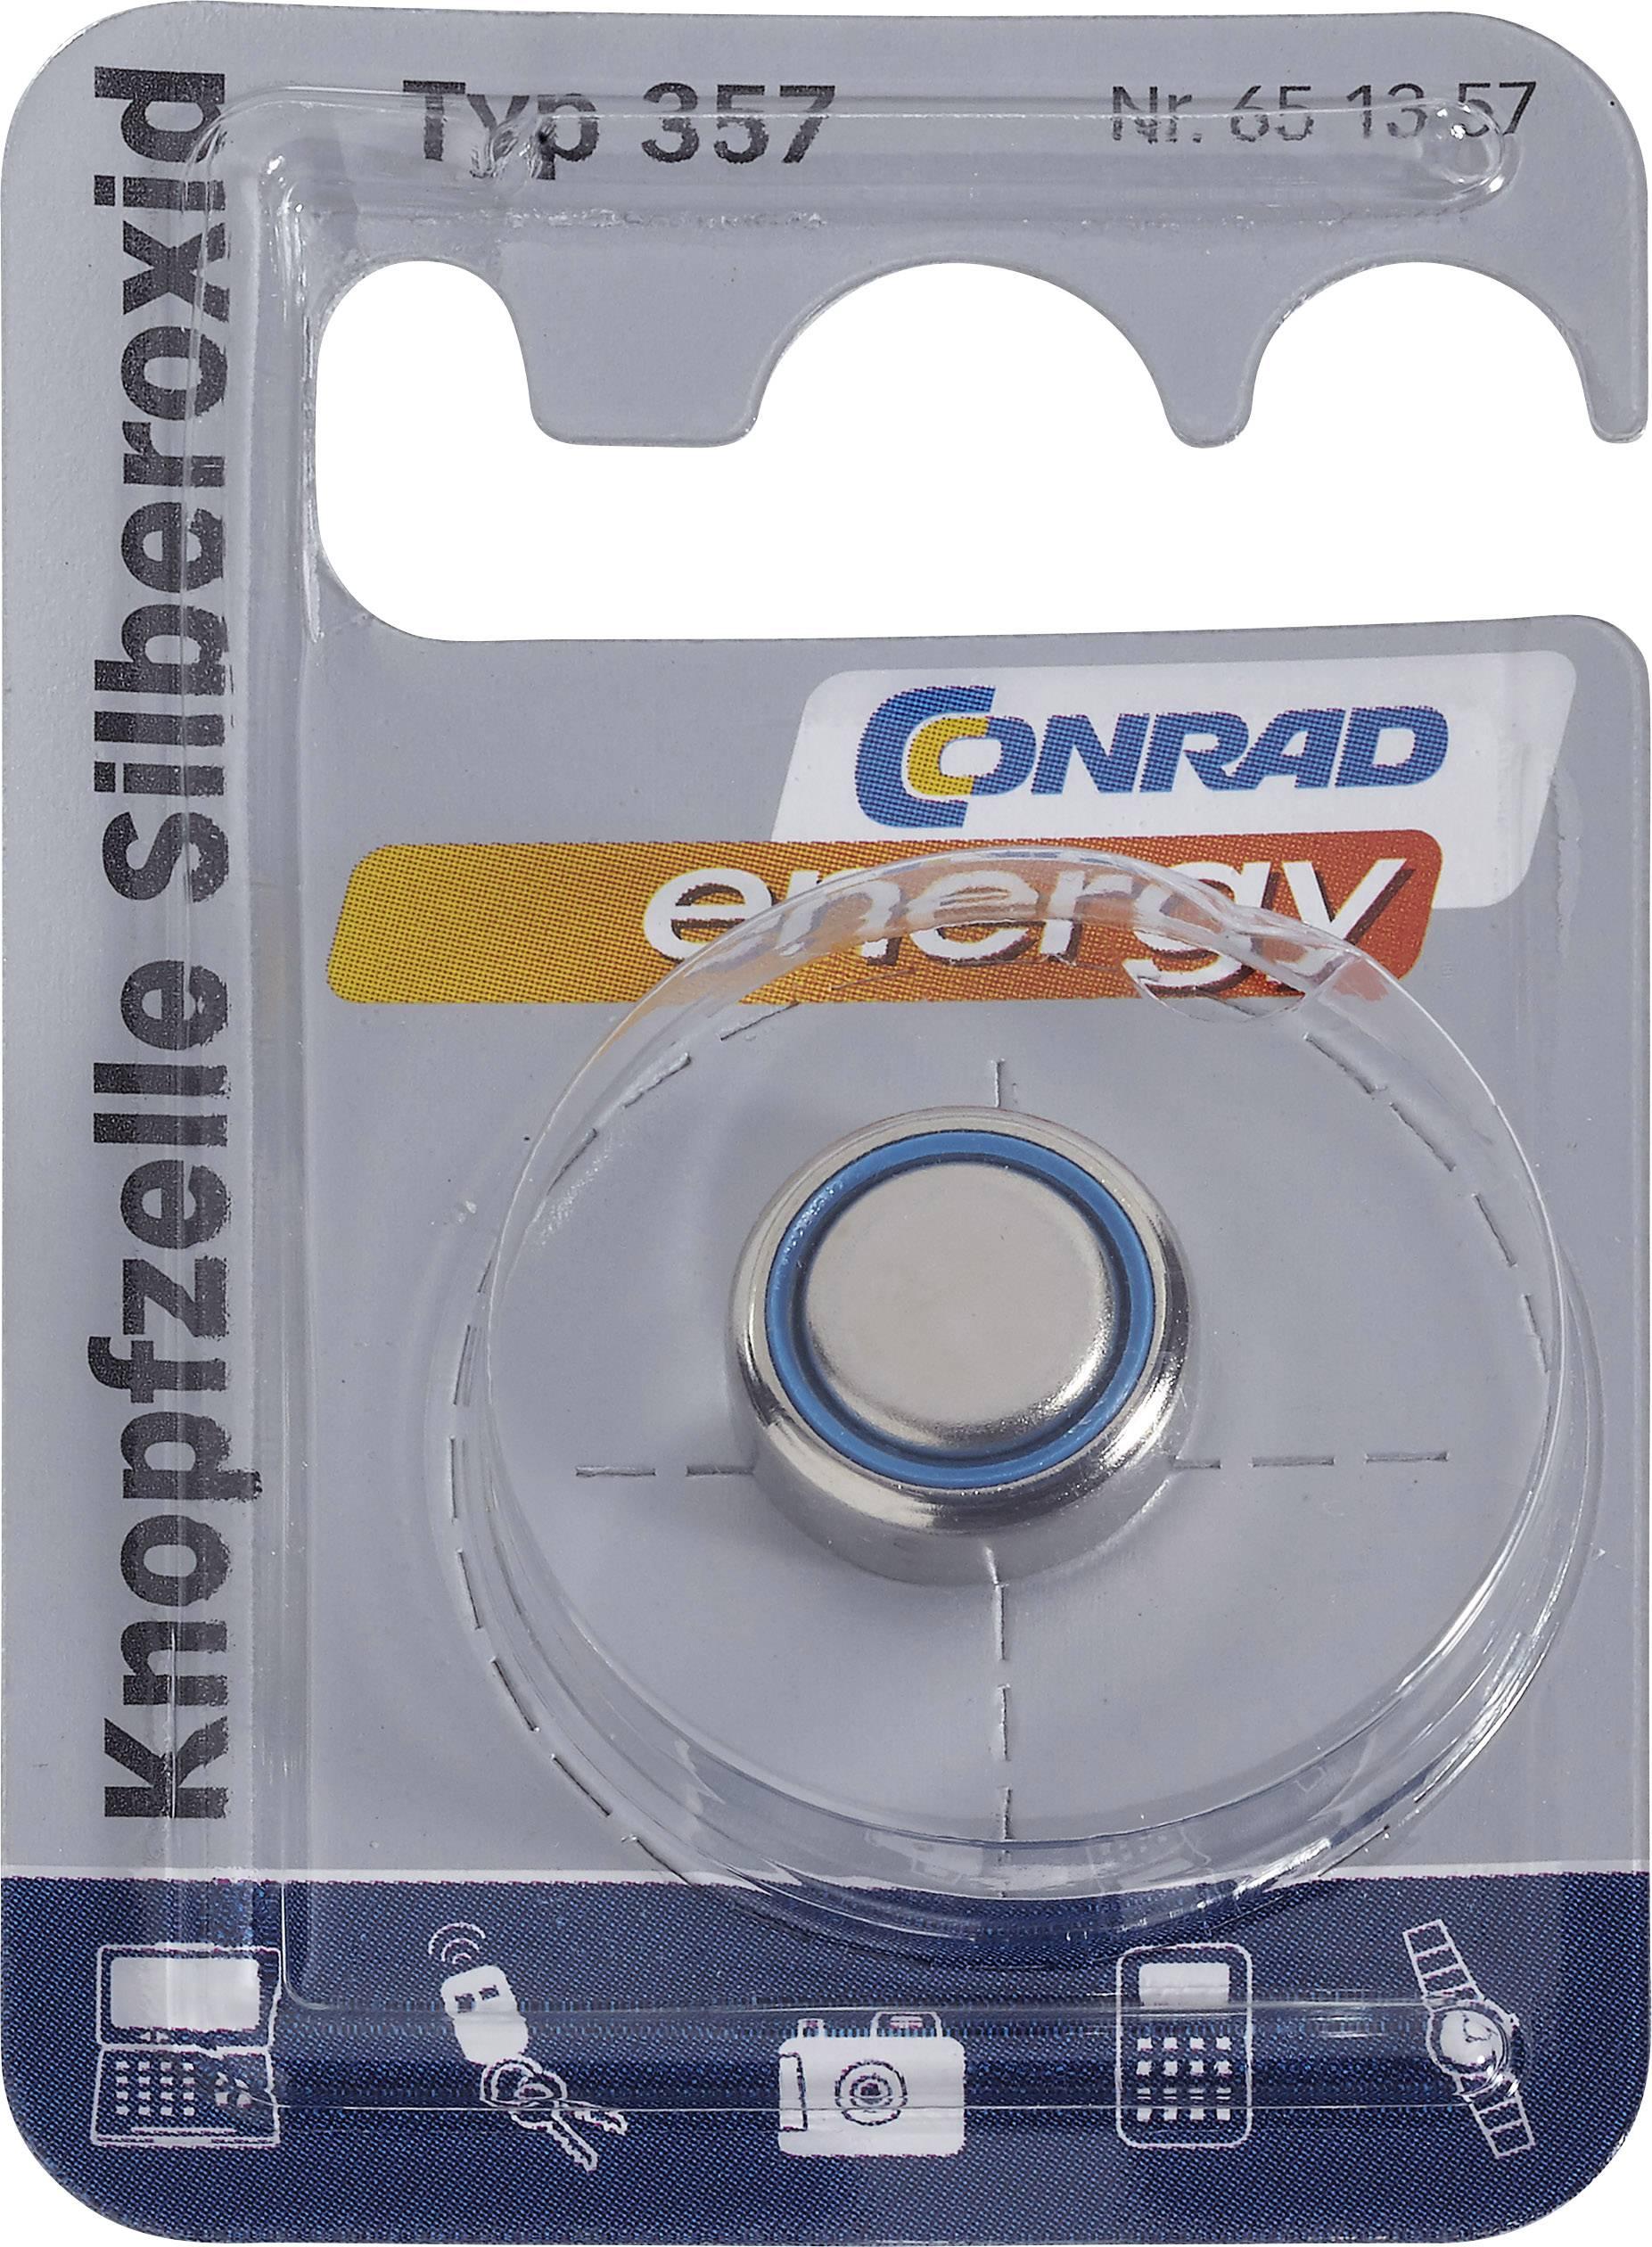 Knoflíková baterie na bázi oxidu stříbra Conrad energy SR44, velikost 357, 165 mAh, 1,55 V